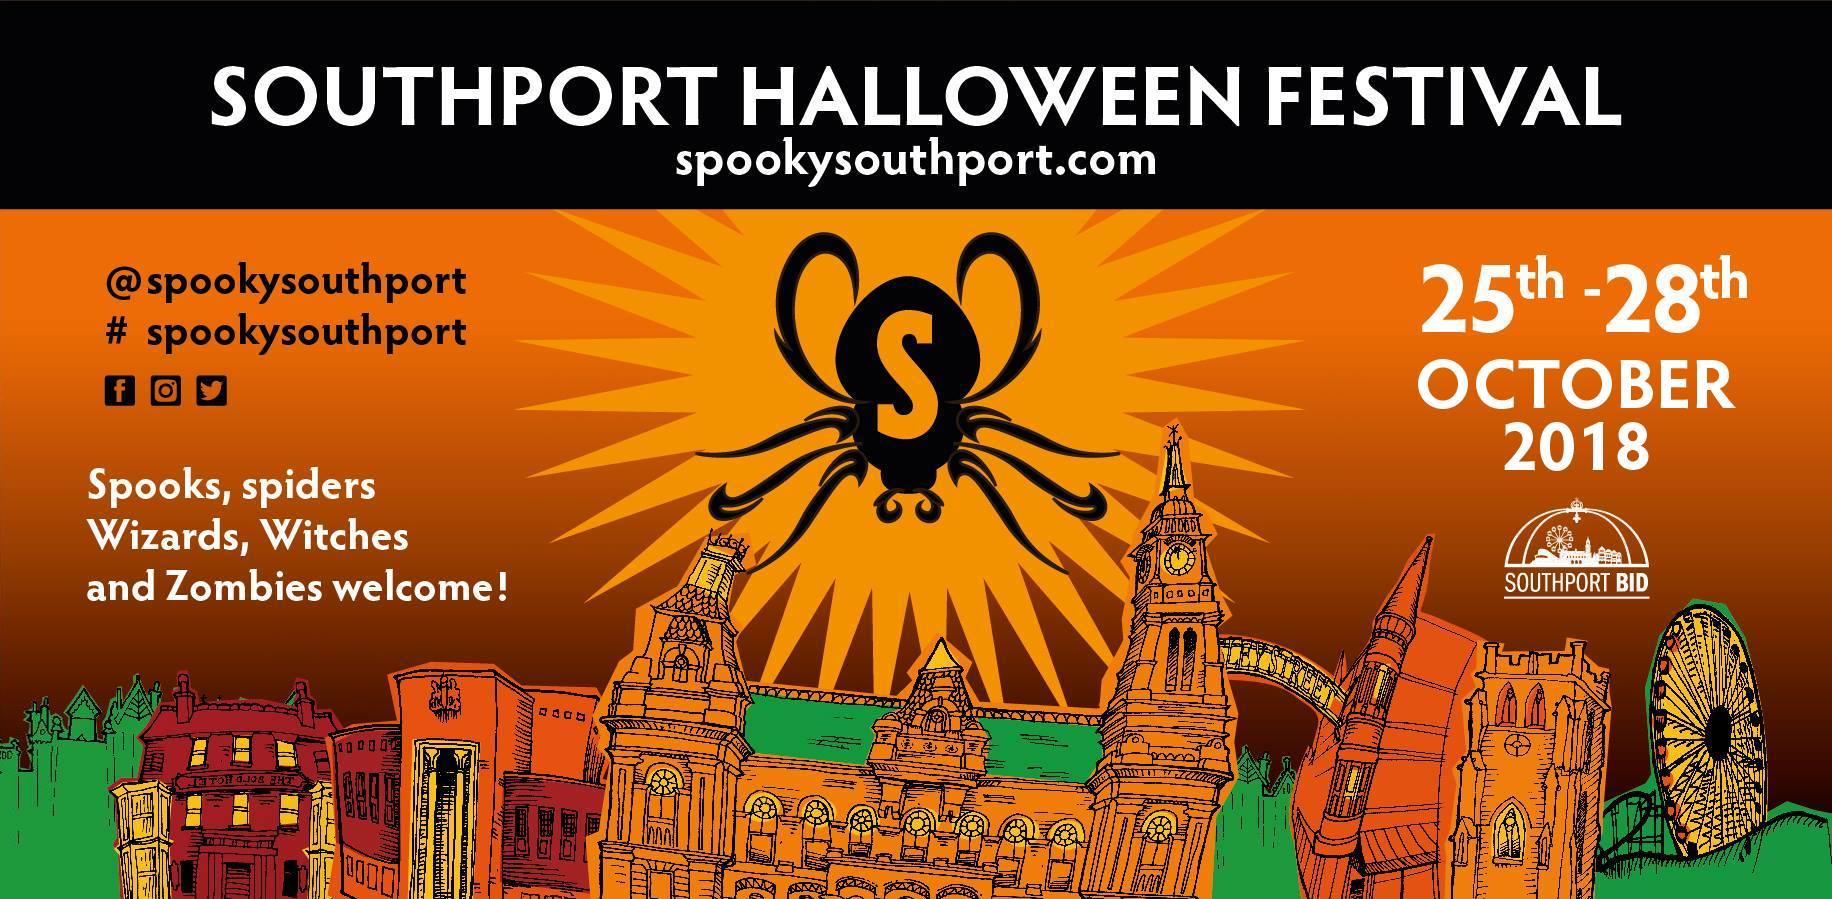 Southport Halloween Festival 2018